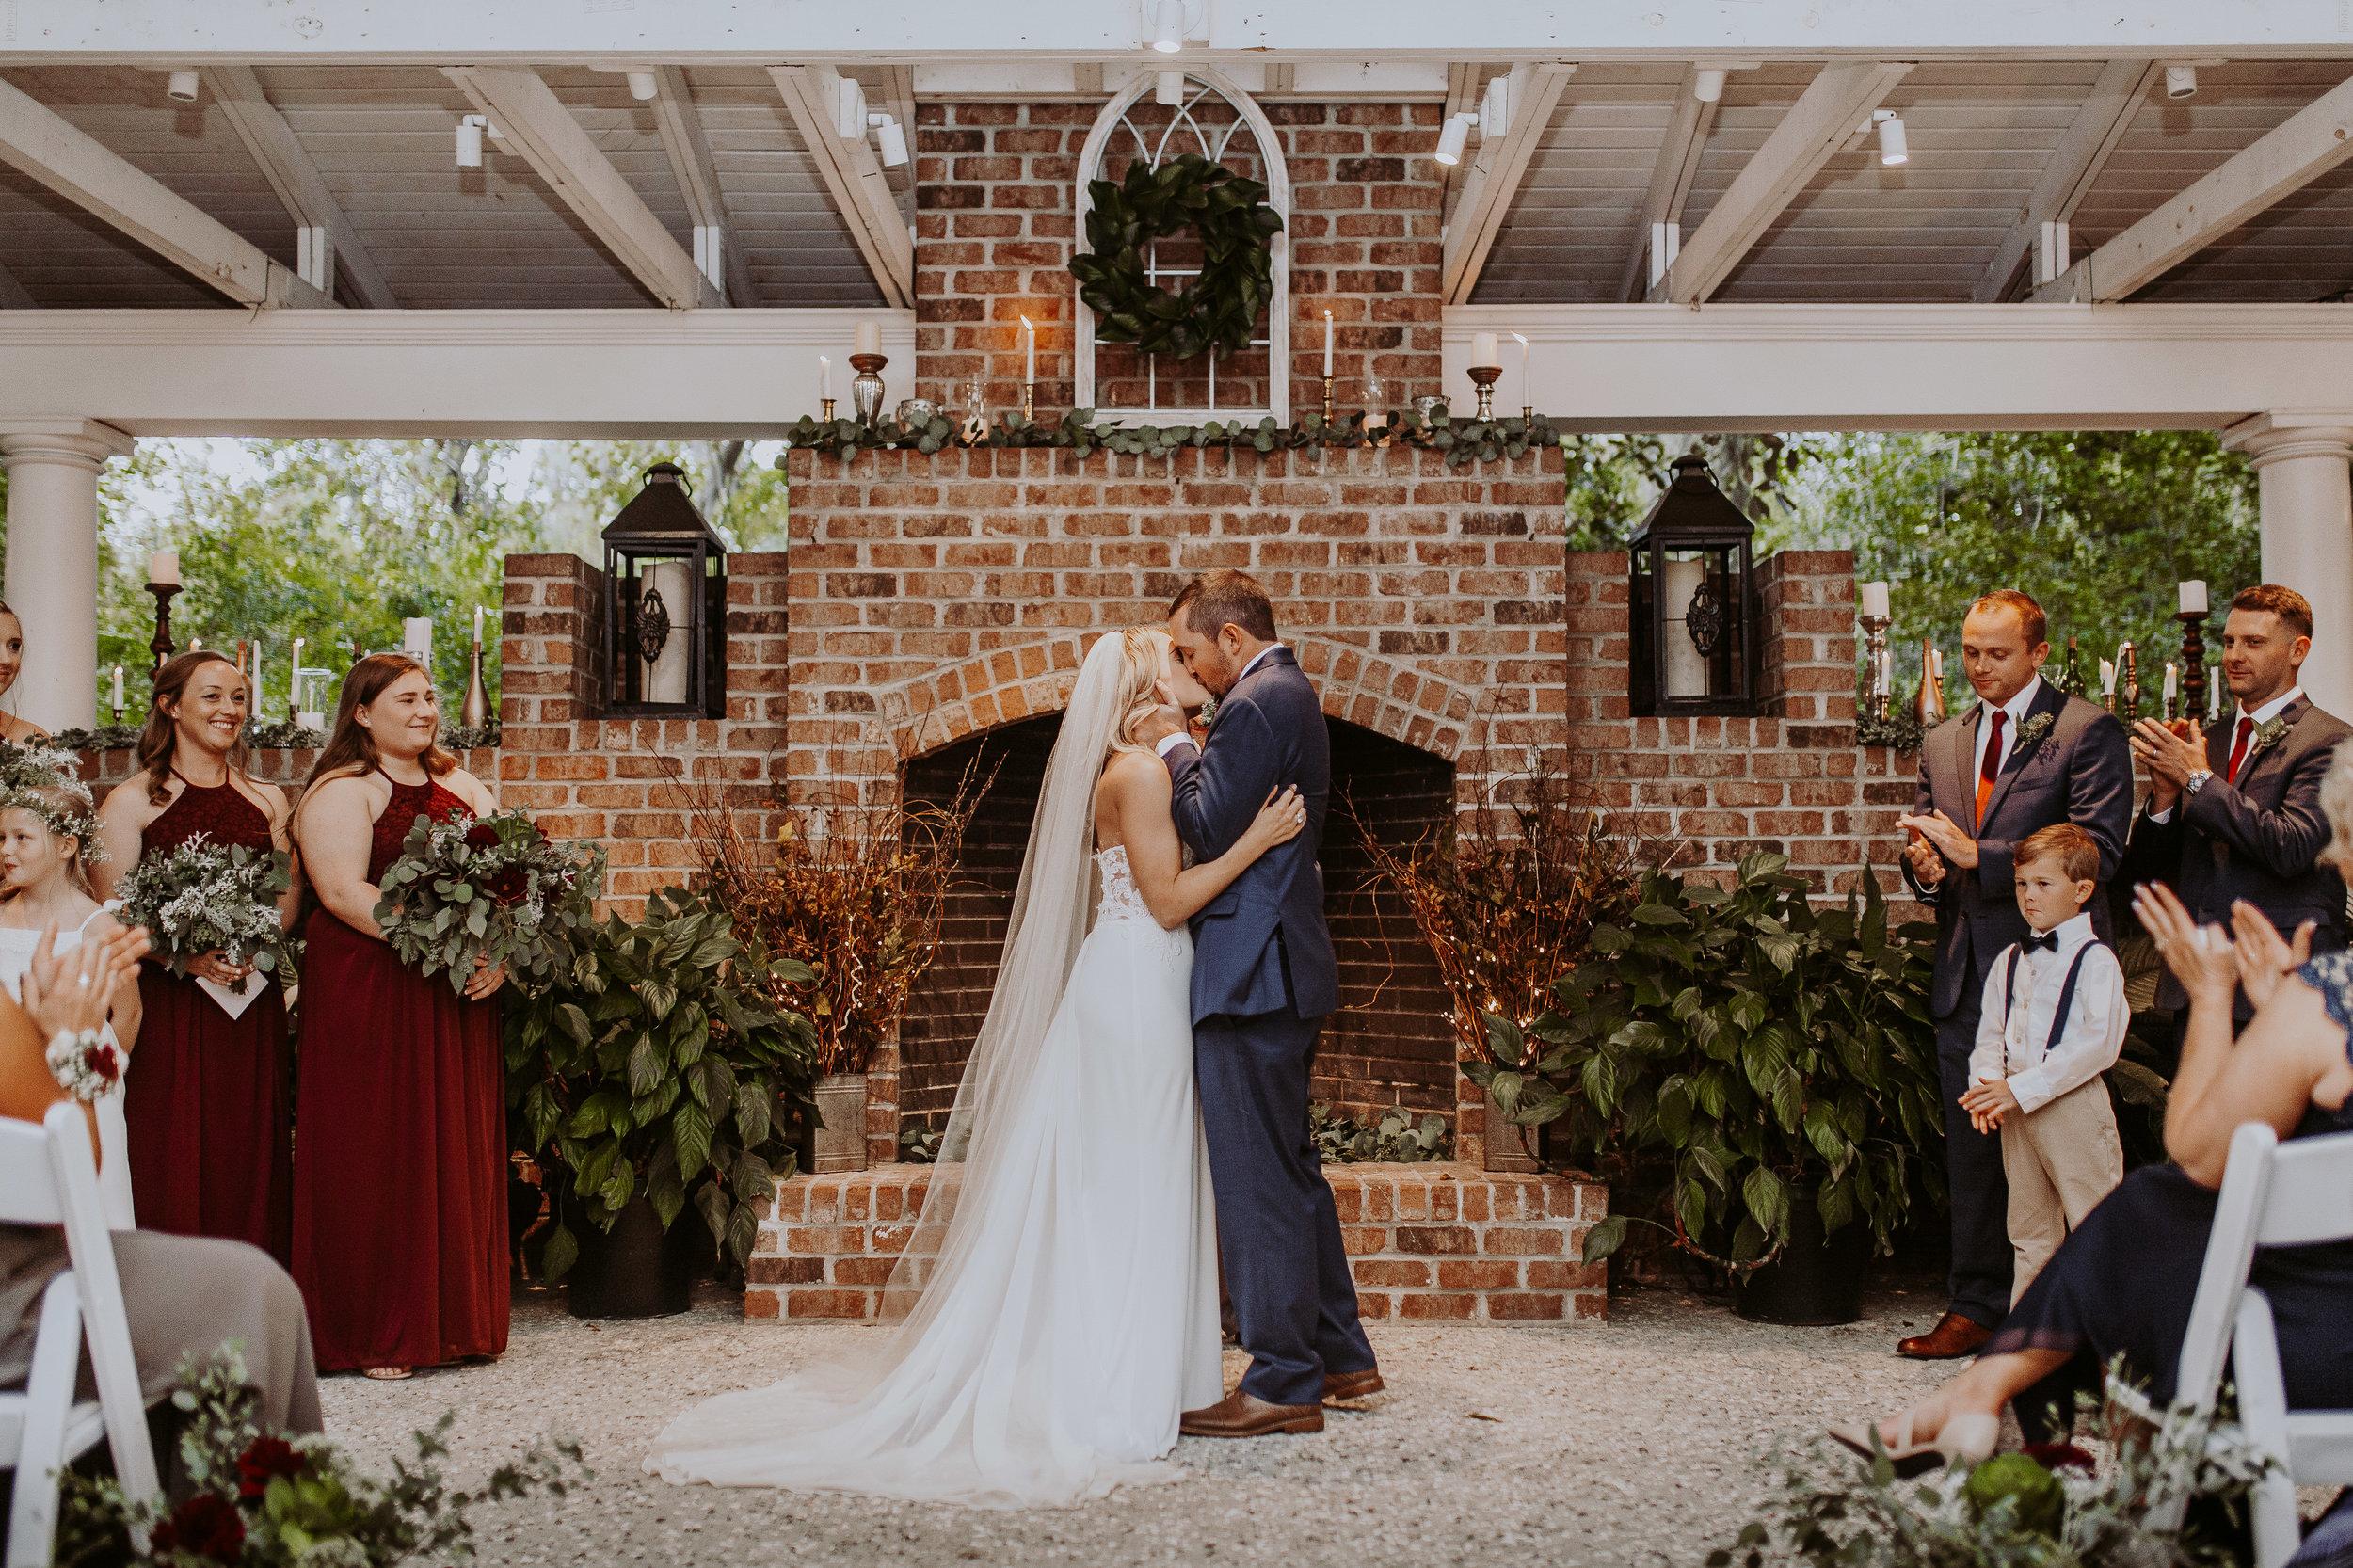 DANIELLE'S MAGICAL MACKEY HOUSE WEDDING